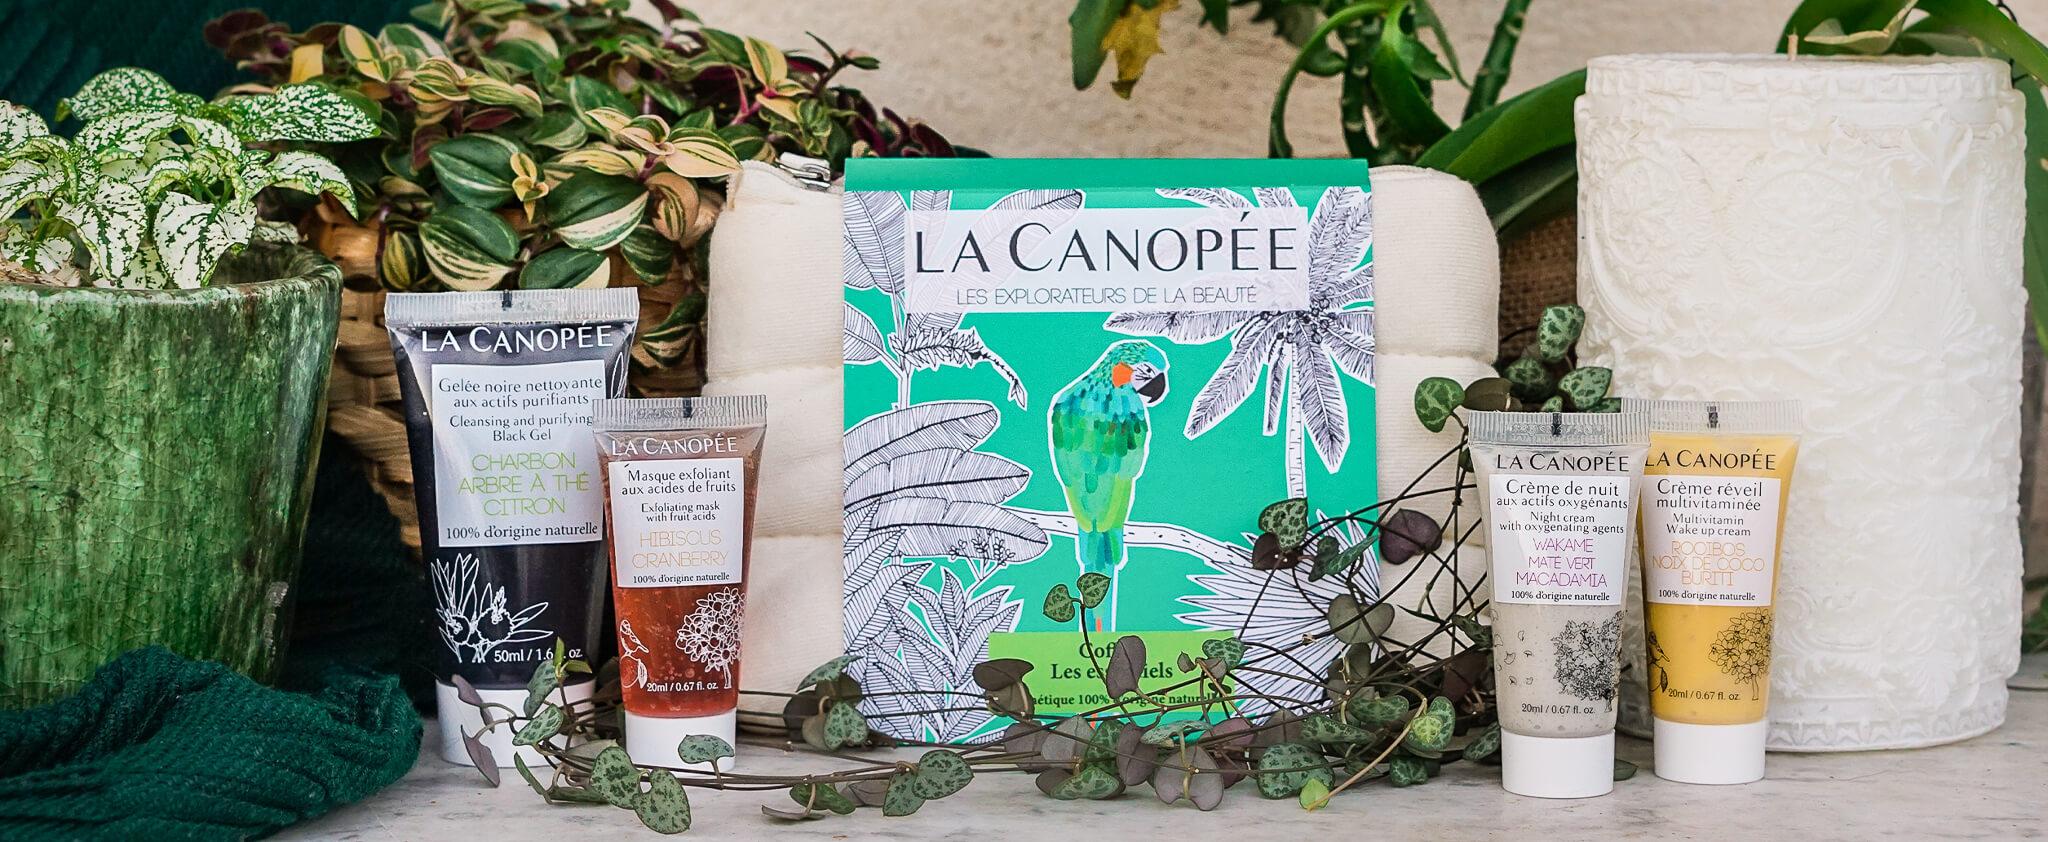 la-canopee-1